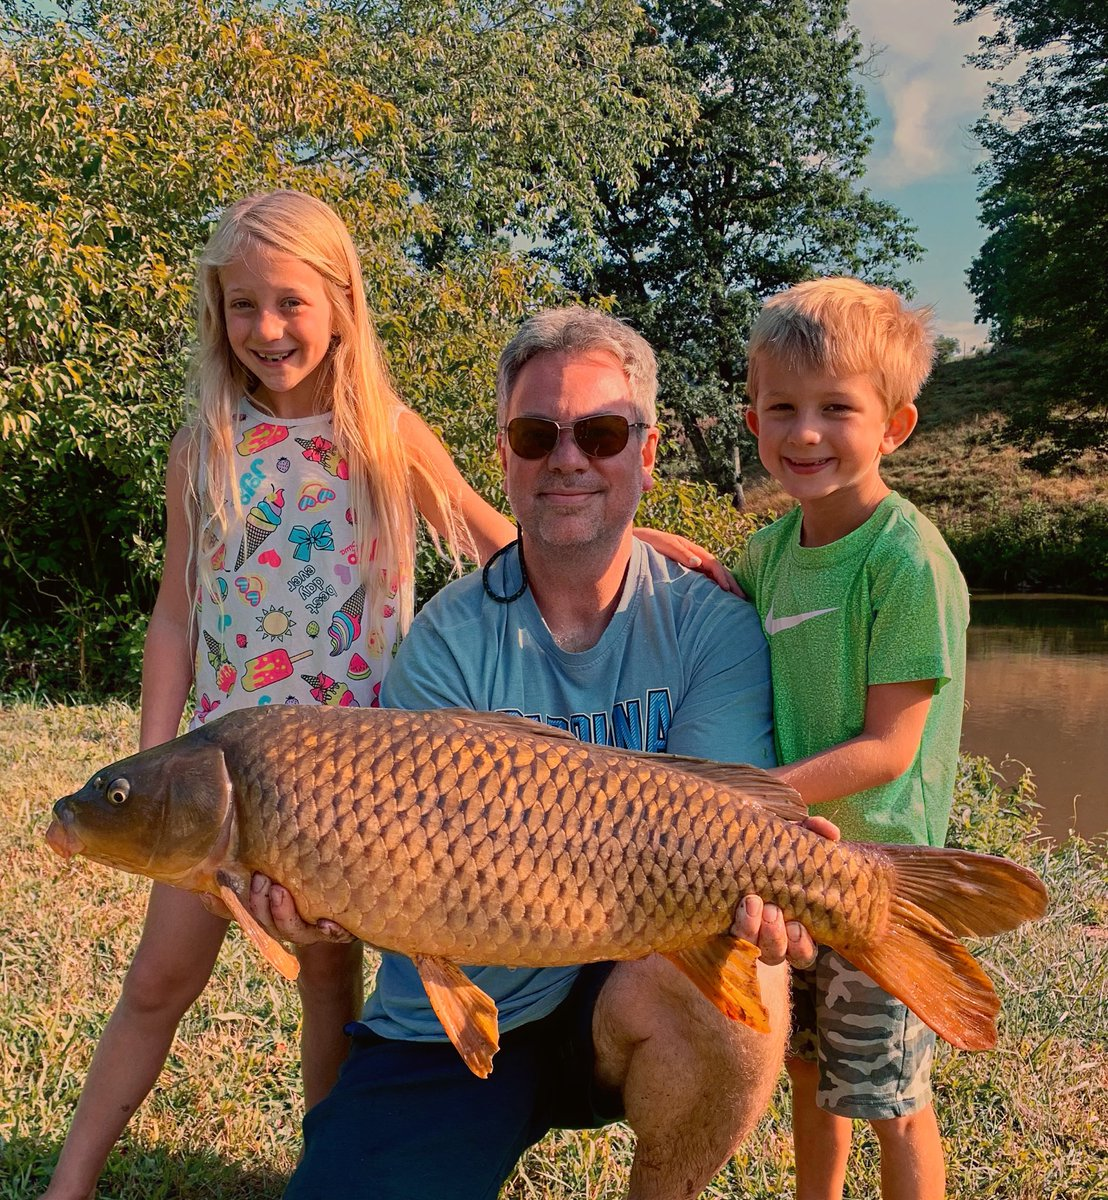 Nice #carp from the New River #carpfishing #fishing #fisherman https://t.co/56bAi2acYV